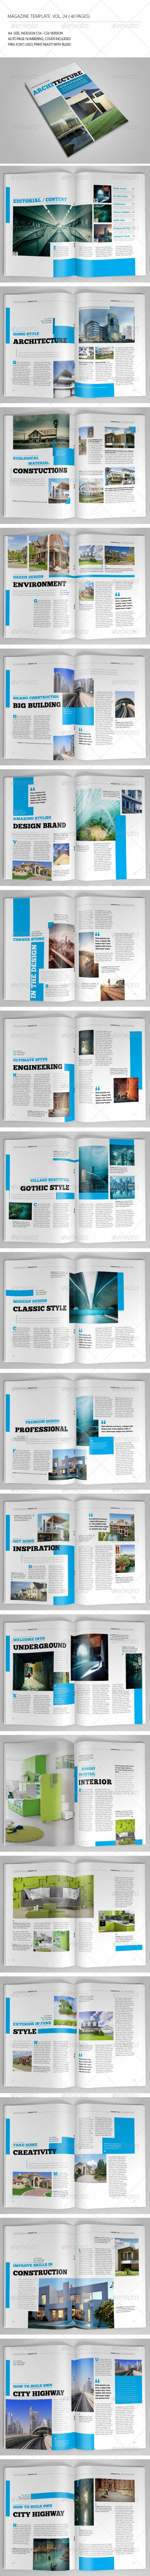 GraphicRiver 40 Pages Architecture Magazine Vol24 7122491